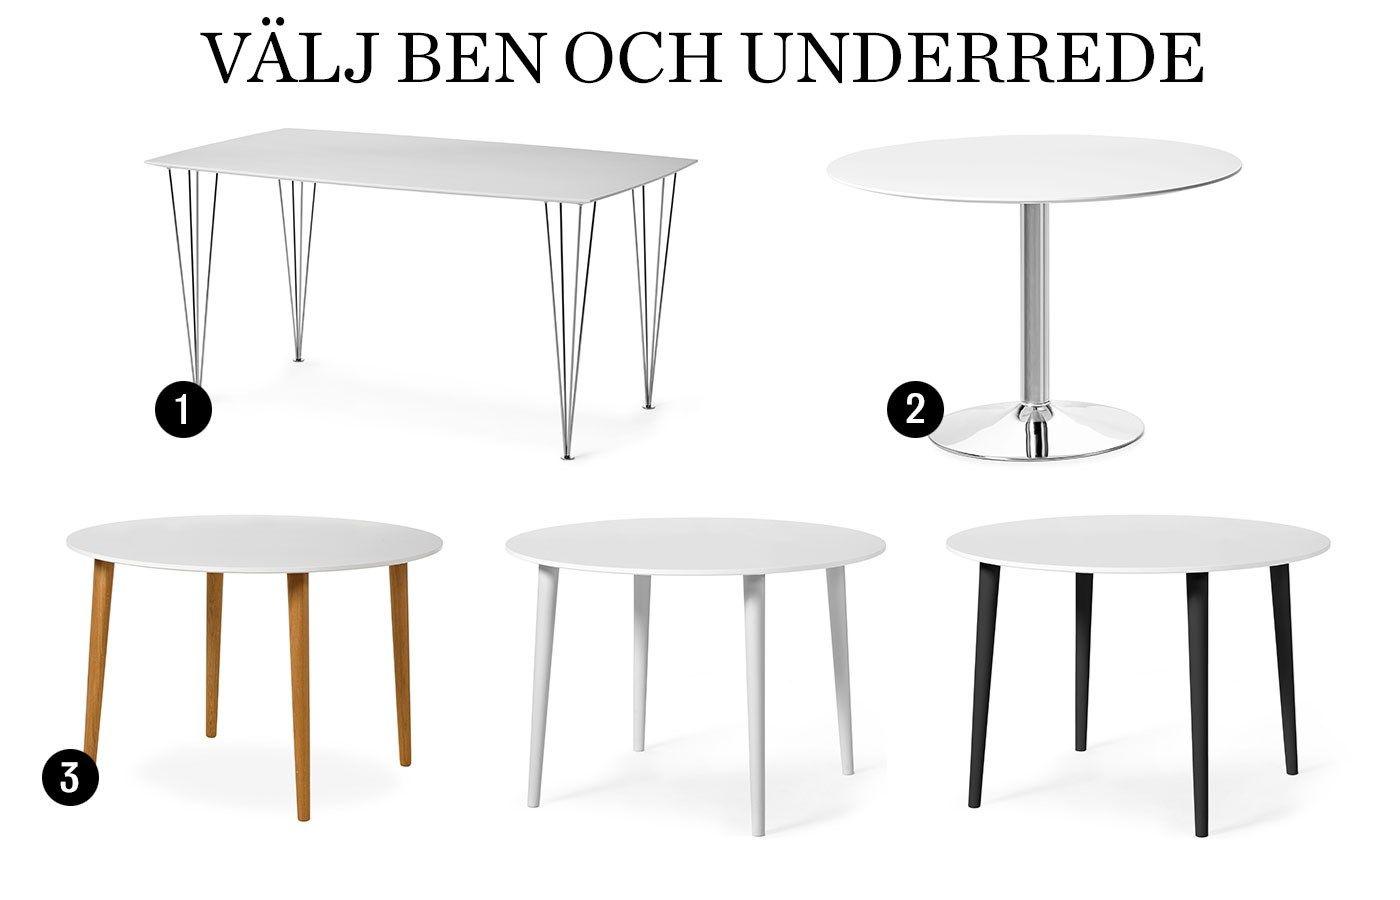 Plaine matbord 9 idéer till ditt hem